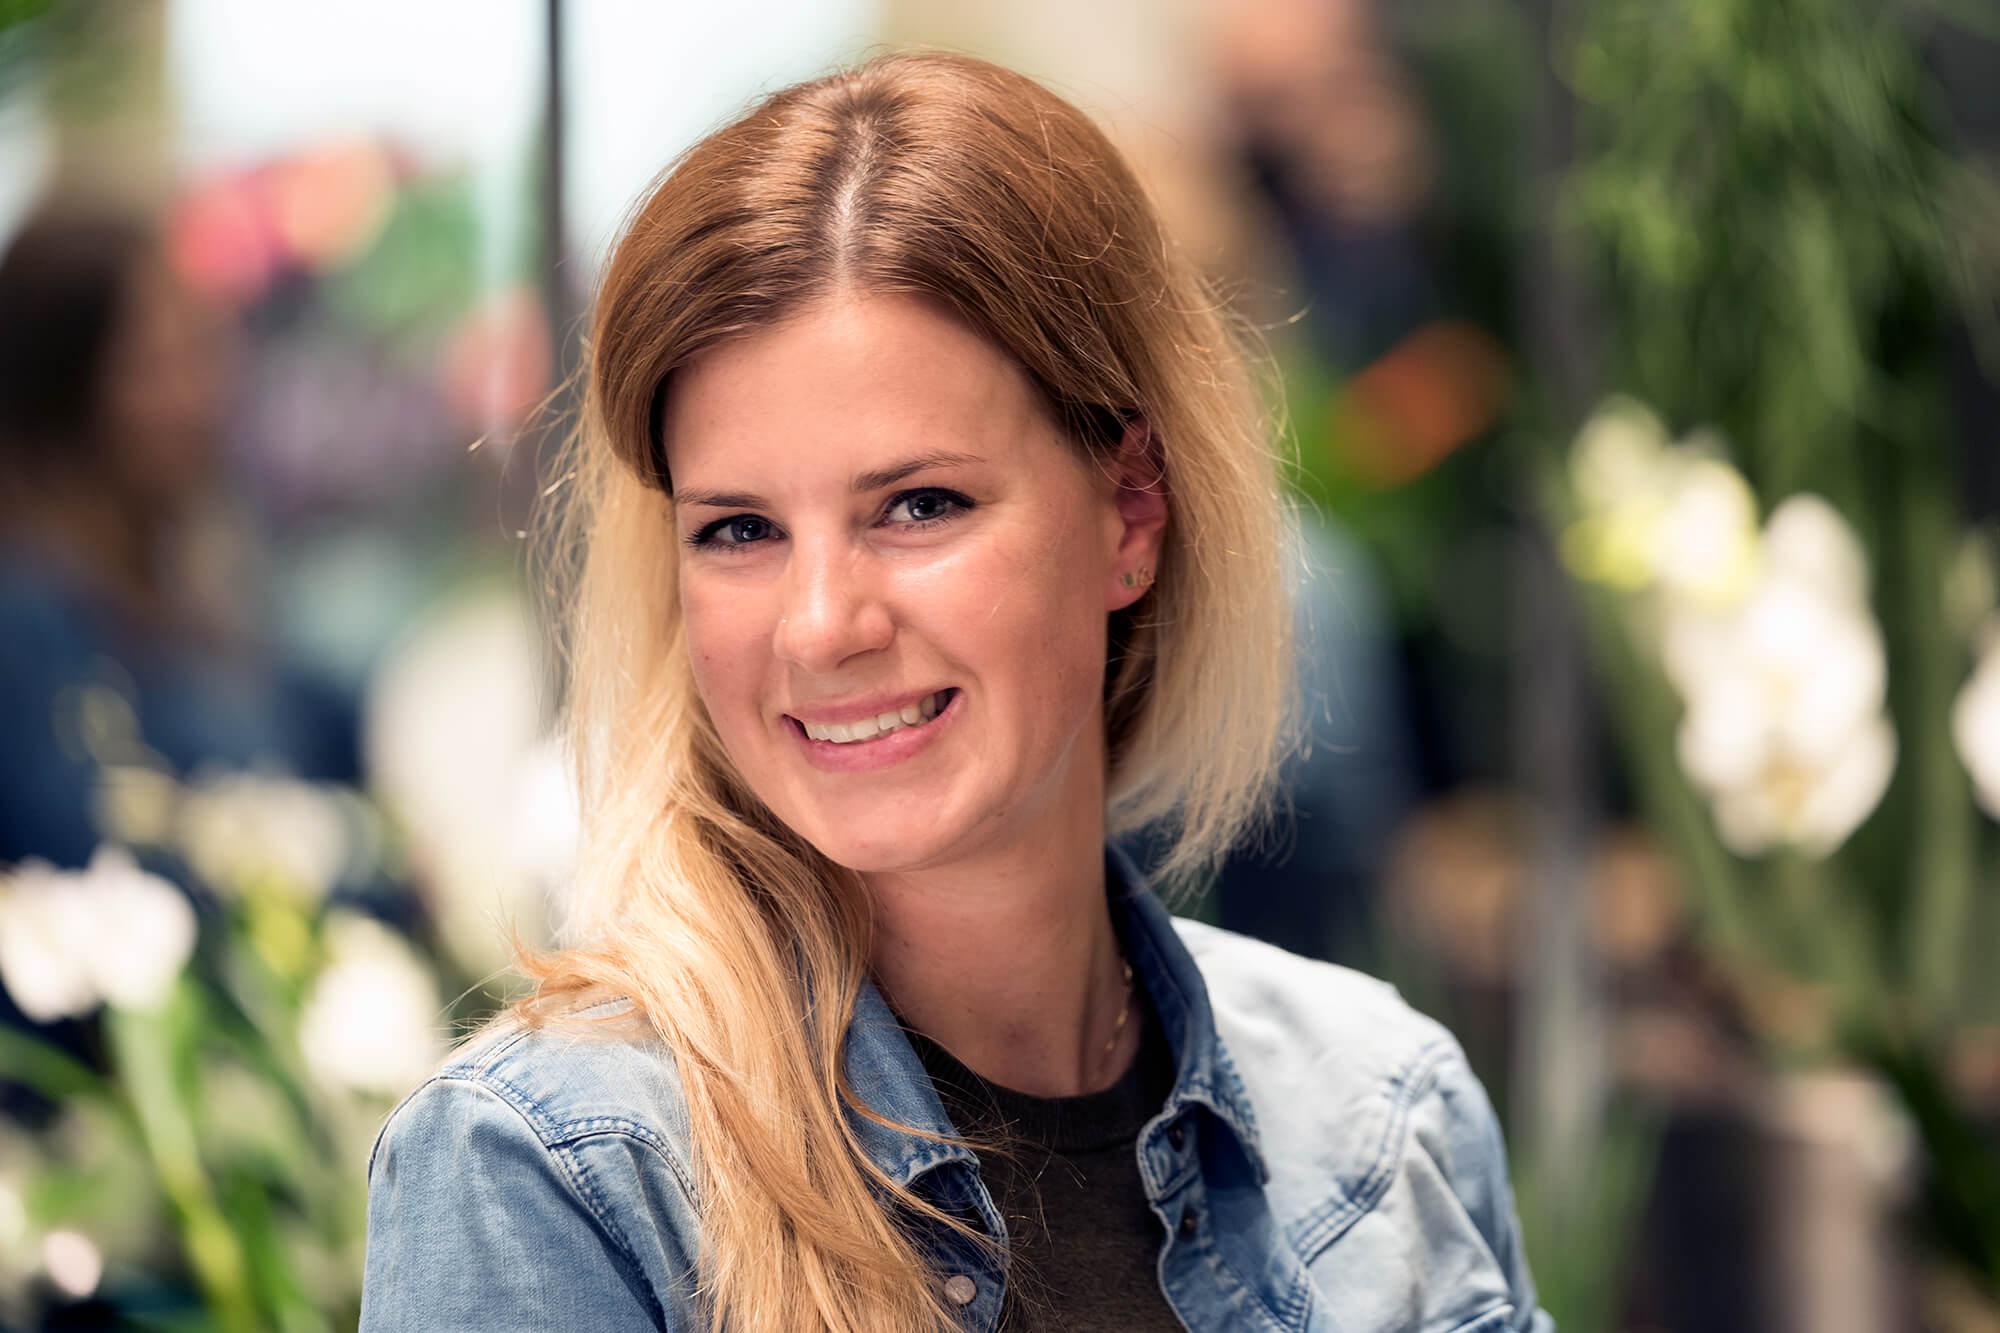 Denise Eckert, Floristin